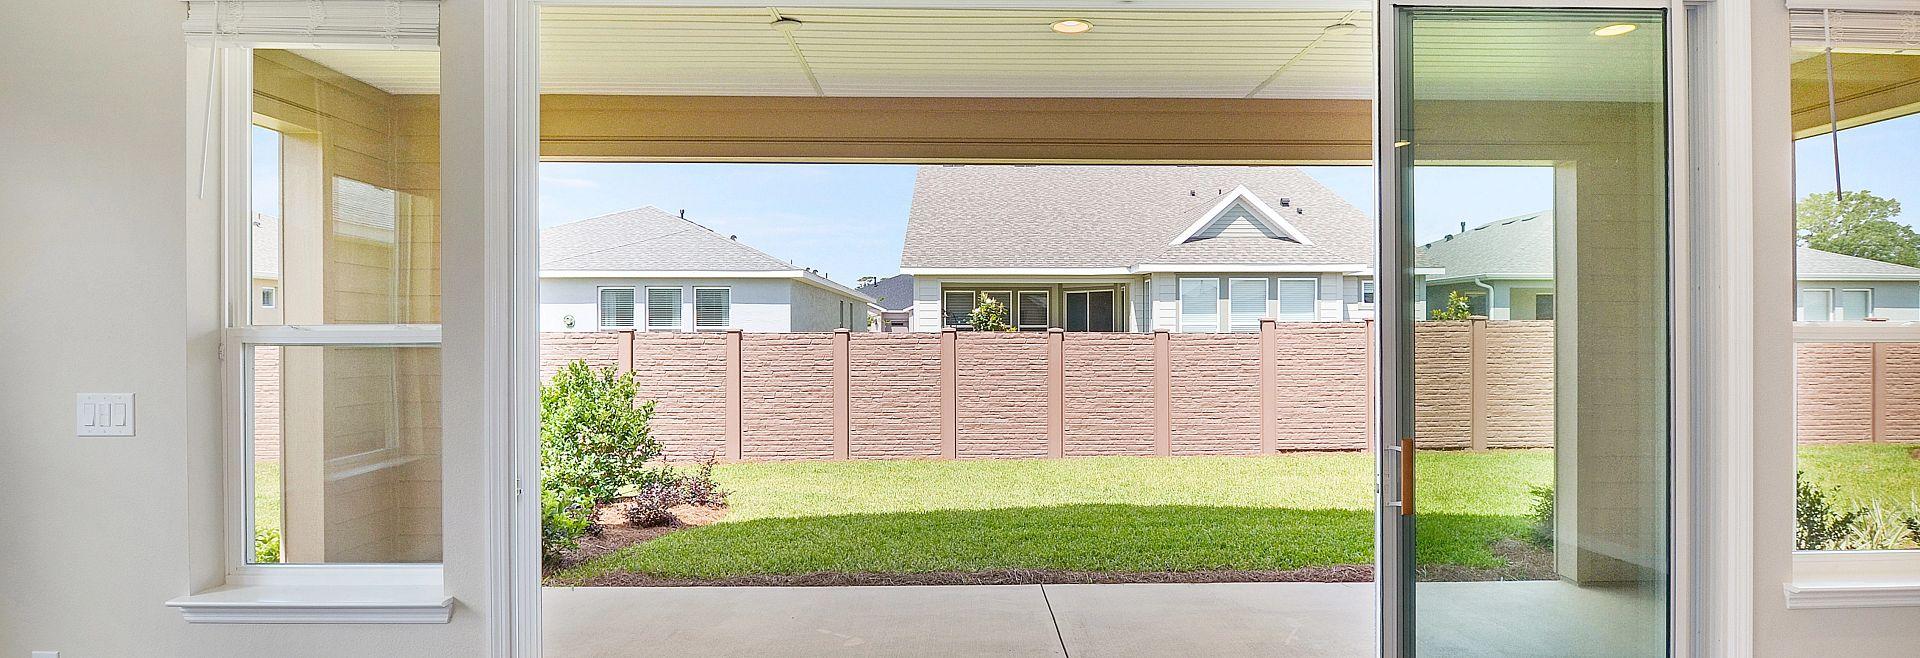 Trilogy at Ocala Preserve Quick Move In Home Refresh Plan Muli-Slide Door